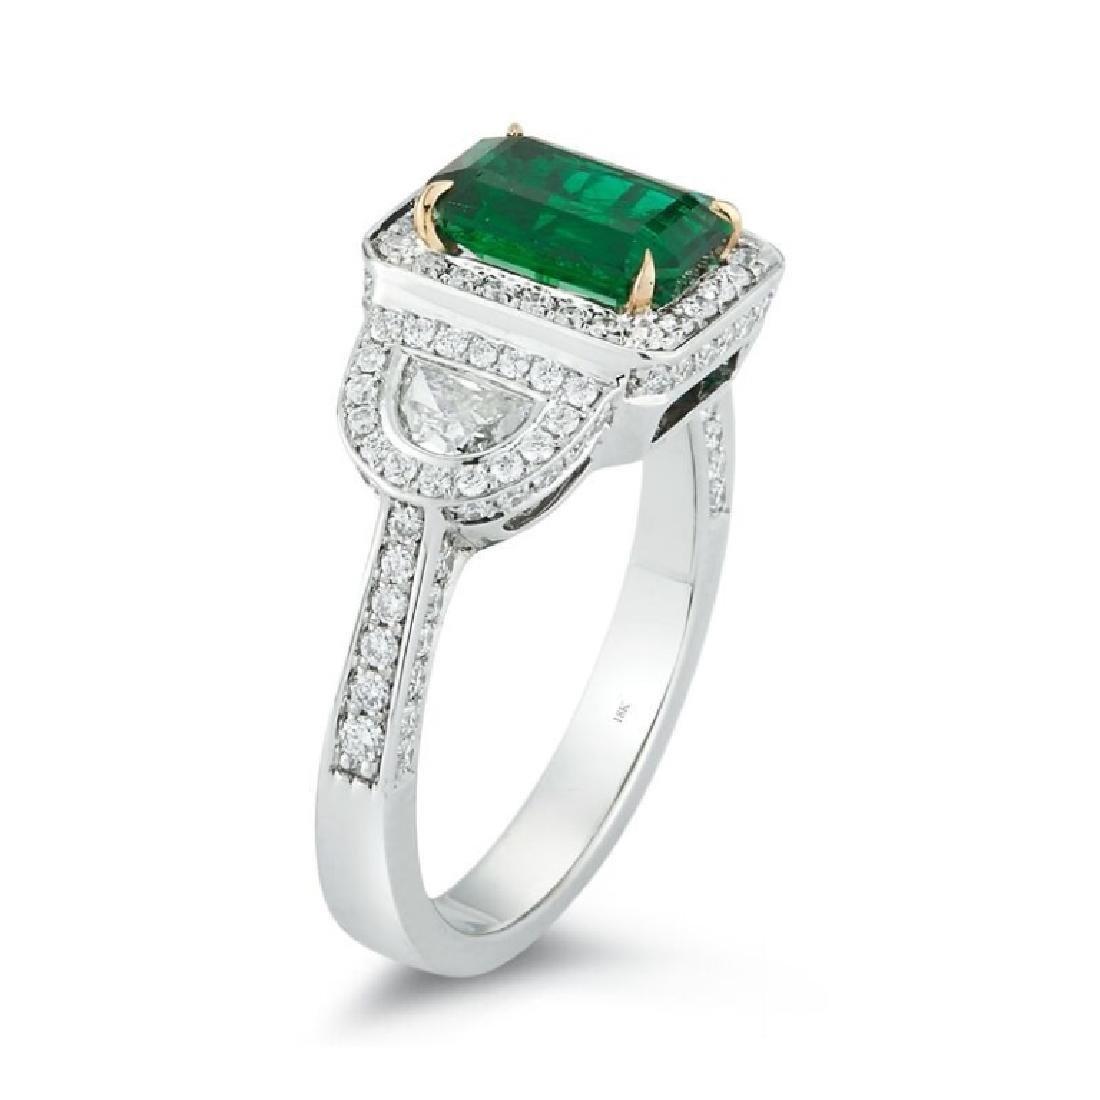 C. Dunaigre, Emerald And Diamond Ring